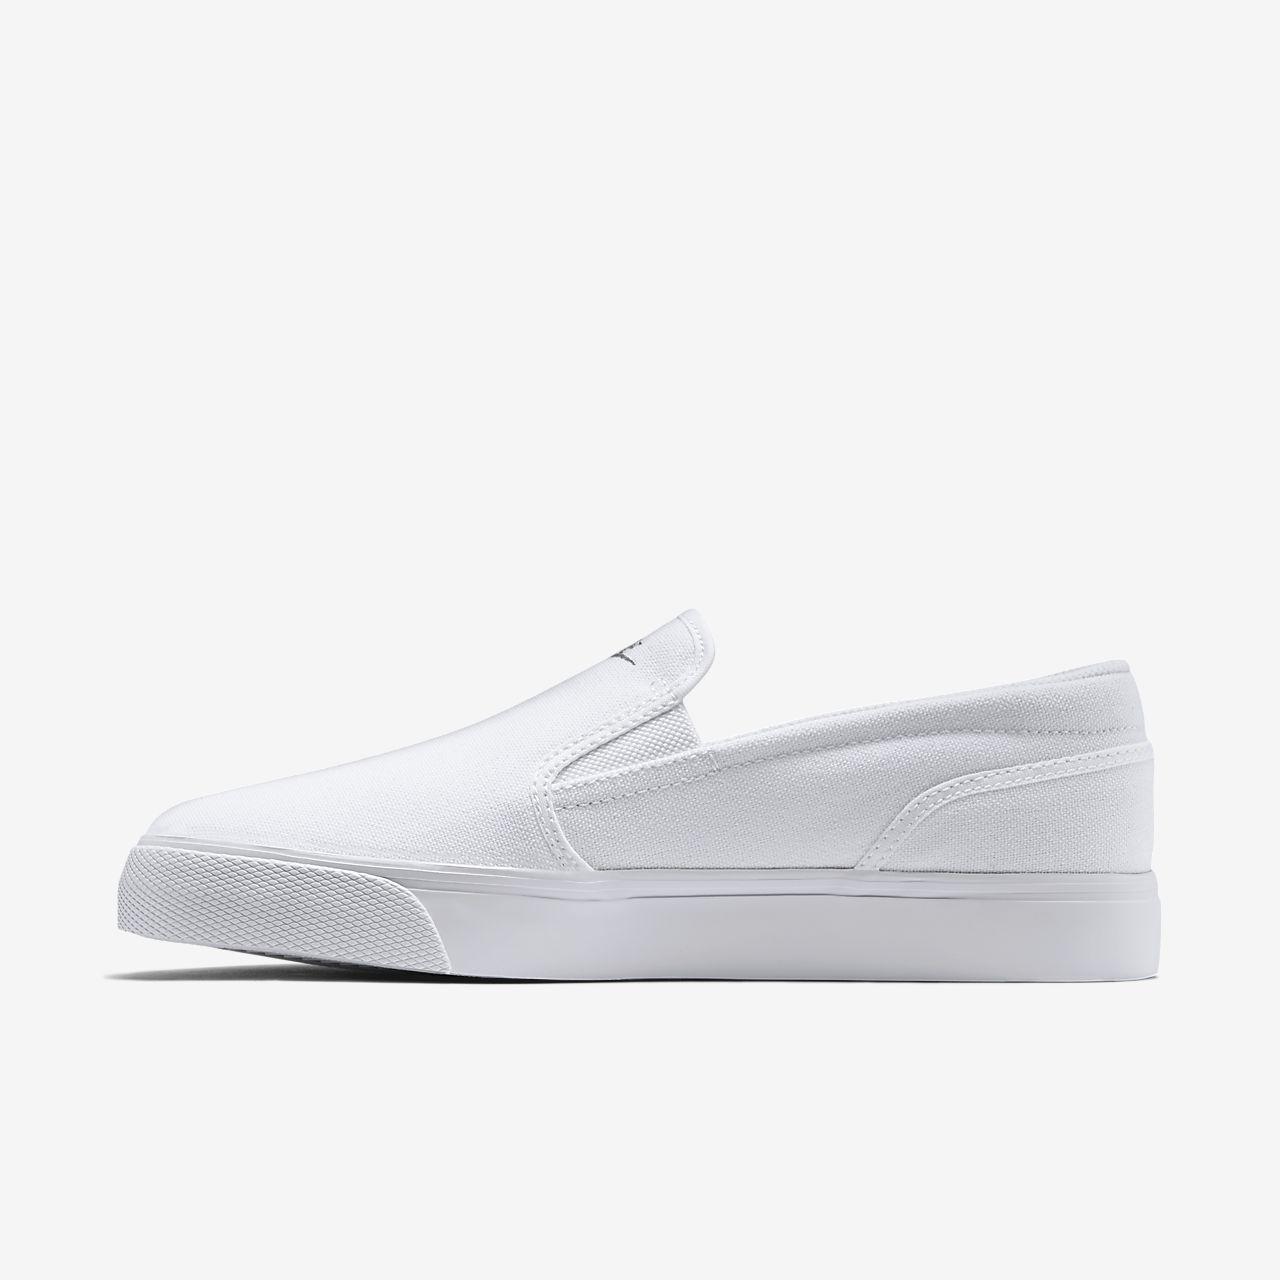 1761832acc71 Nike Toki Slip-On Canvas Women s Shoe. Nike.com IN